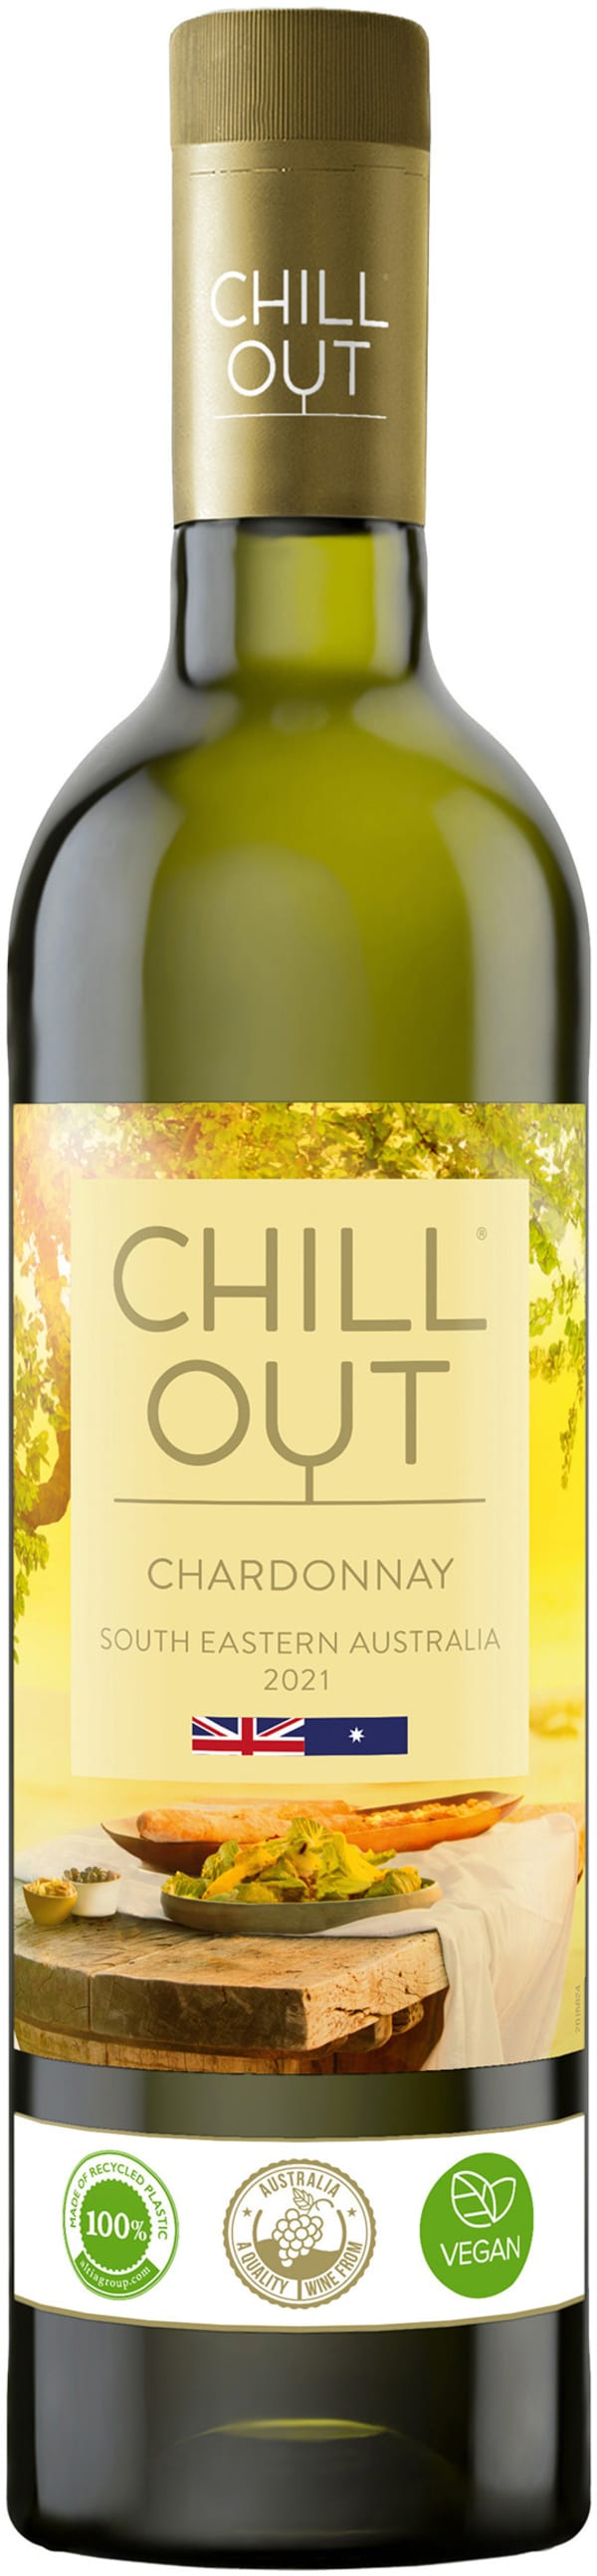 Chill Out Chardonnay Australia 2018 plastic bottle